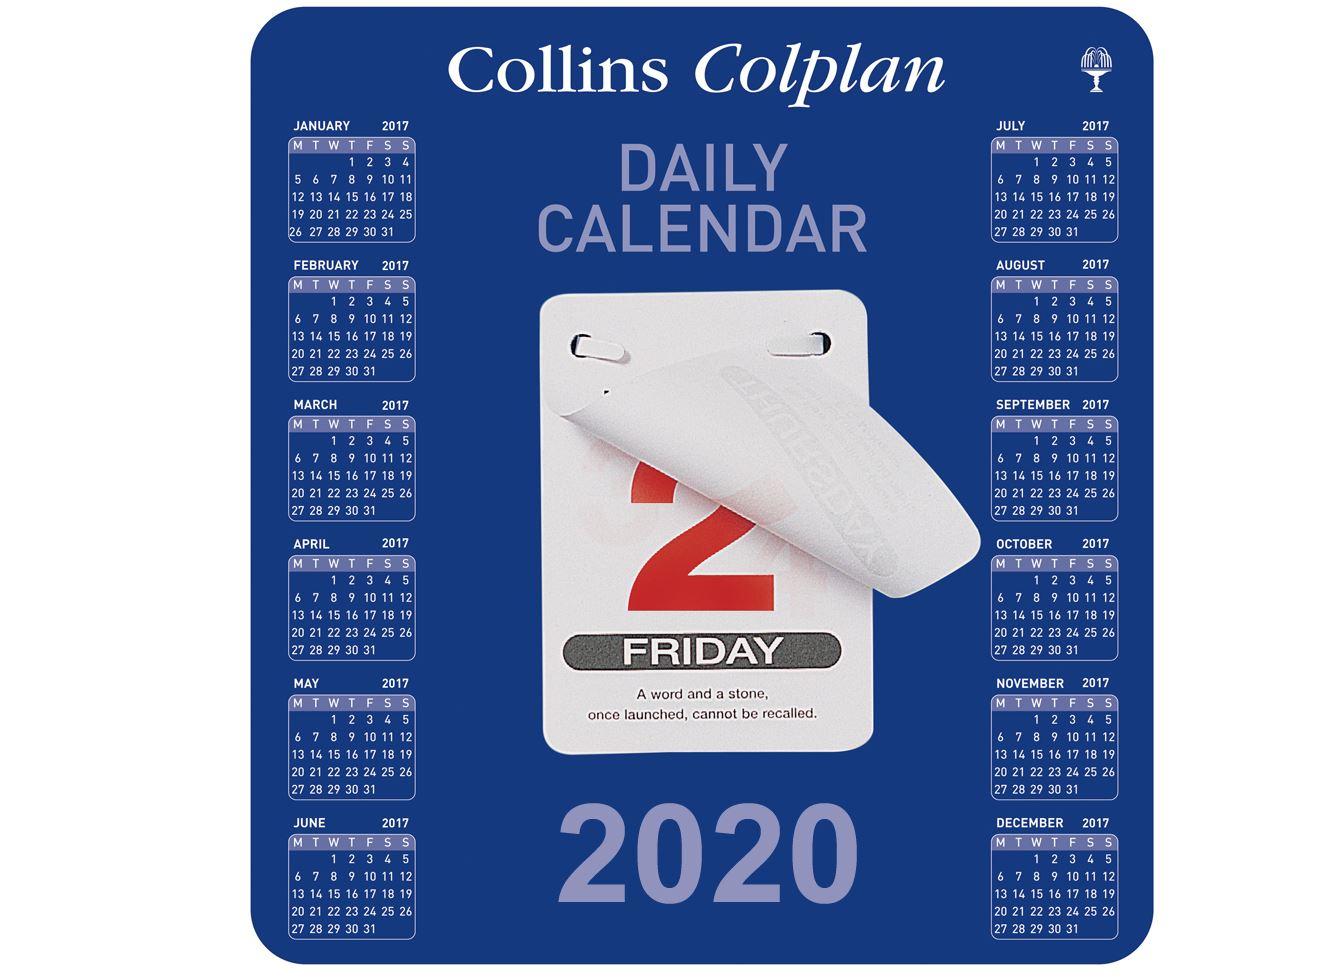 Collins Colplan Daily Block Calendar 2020